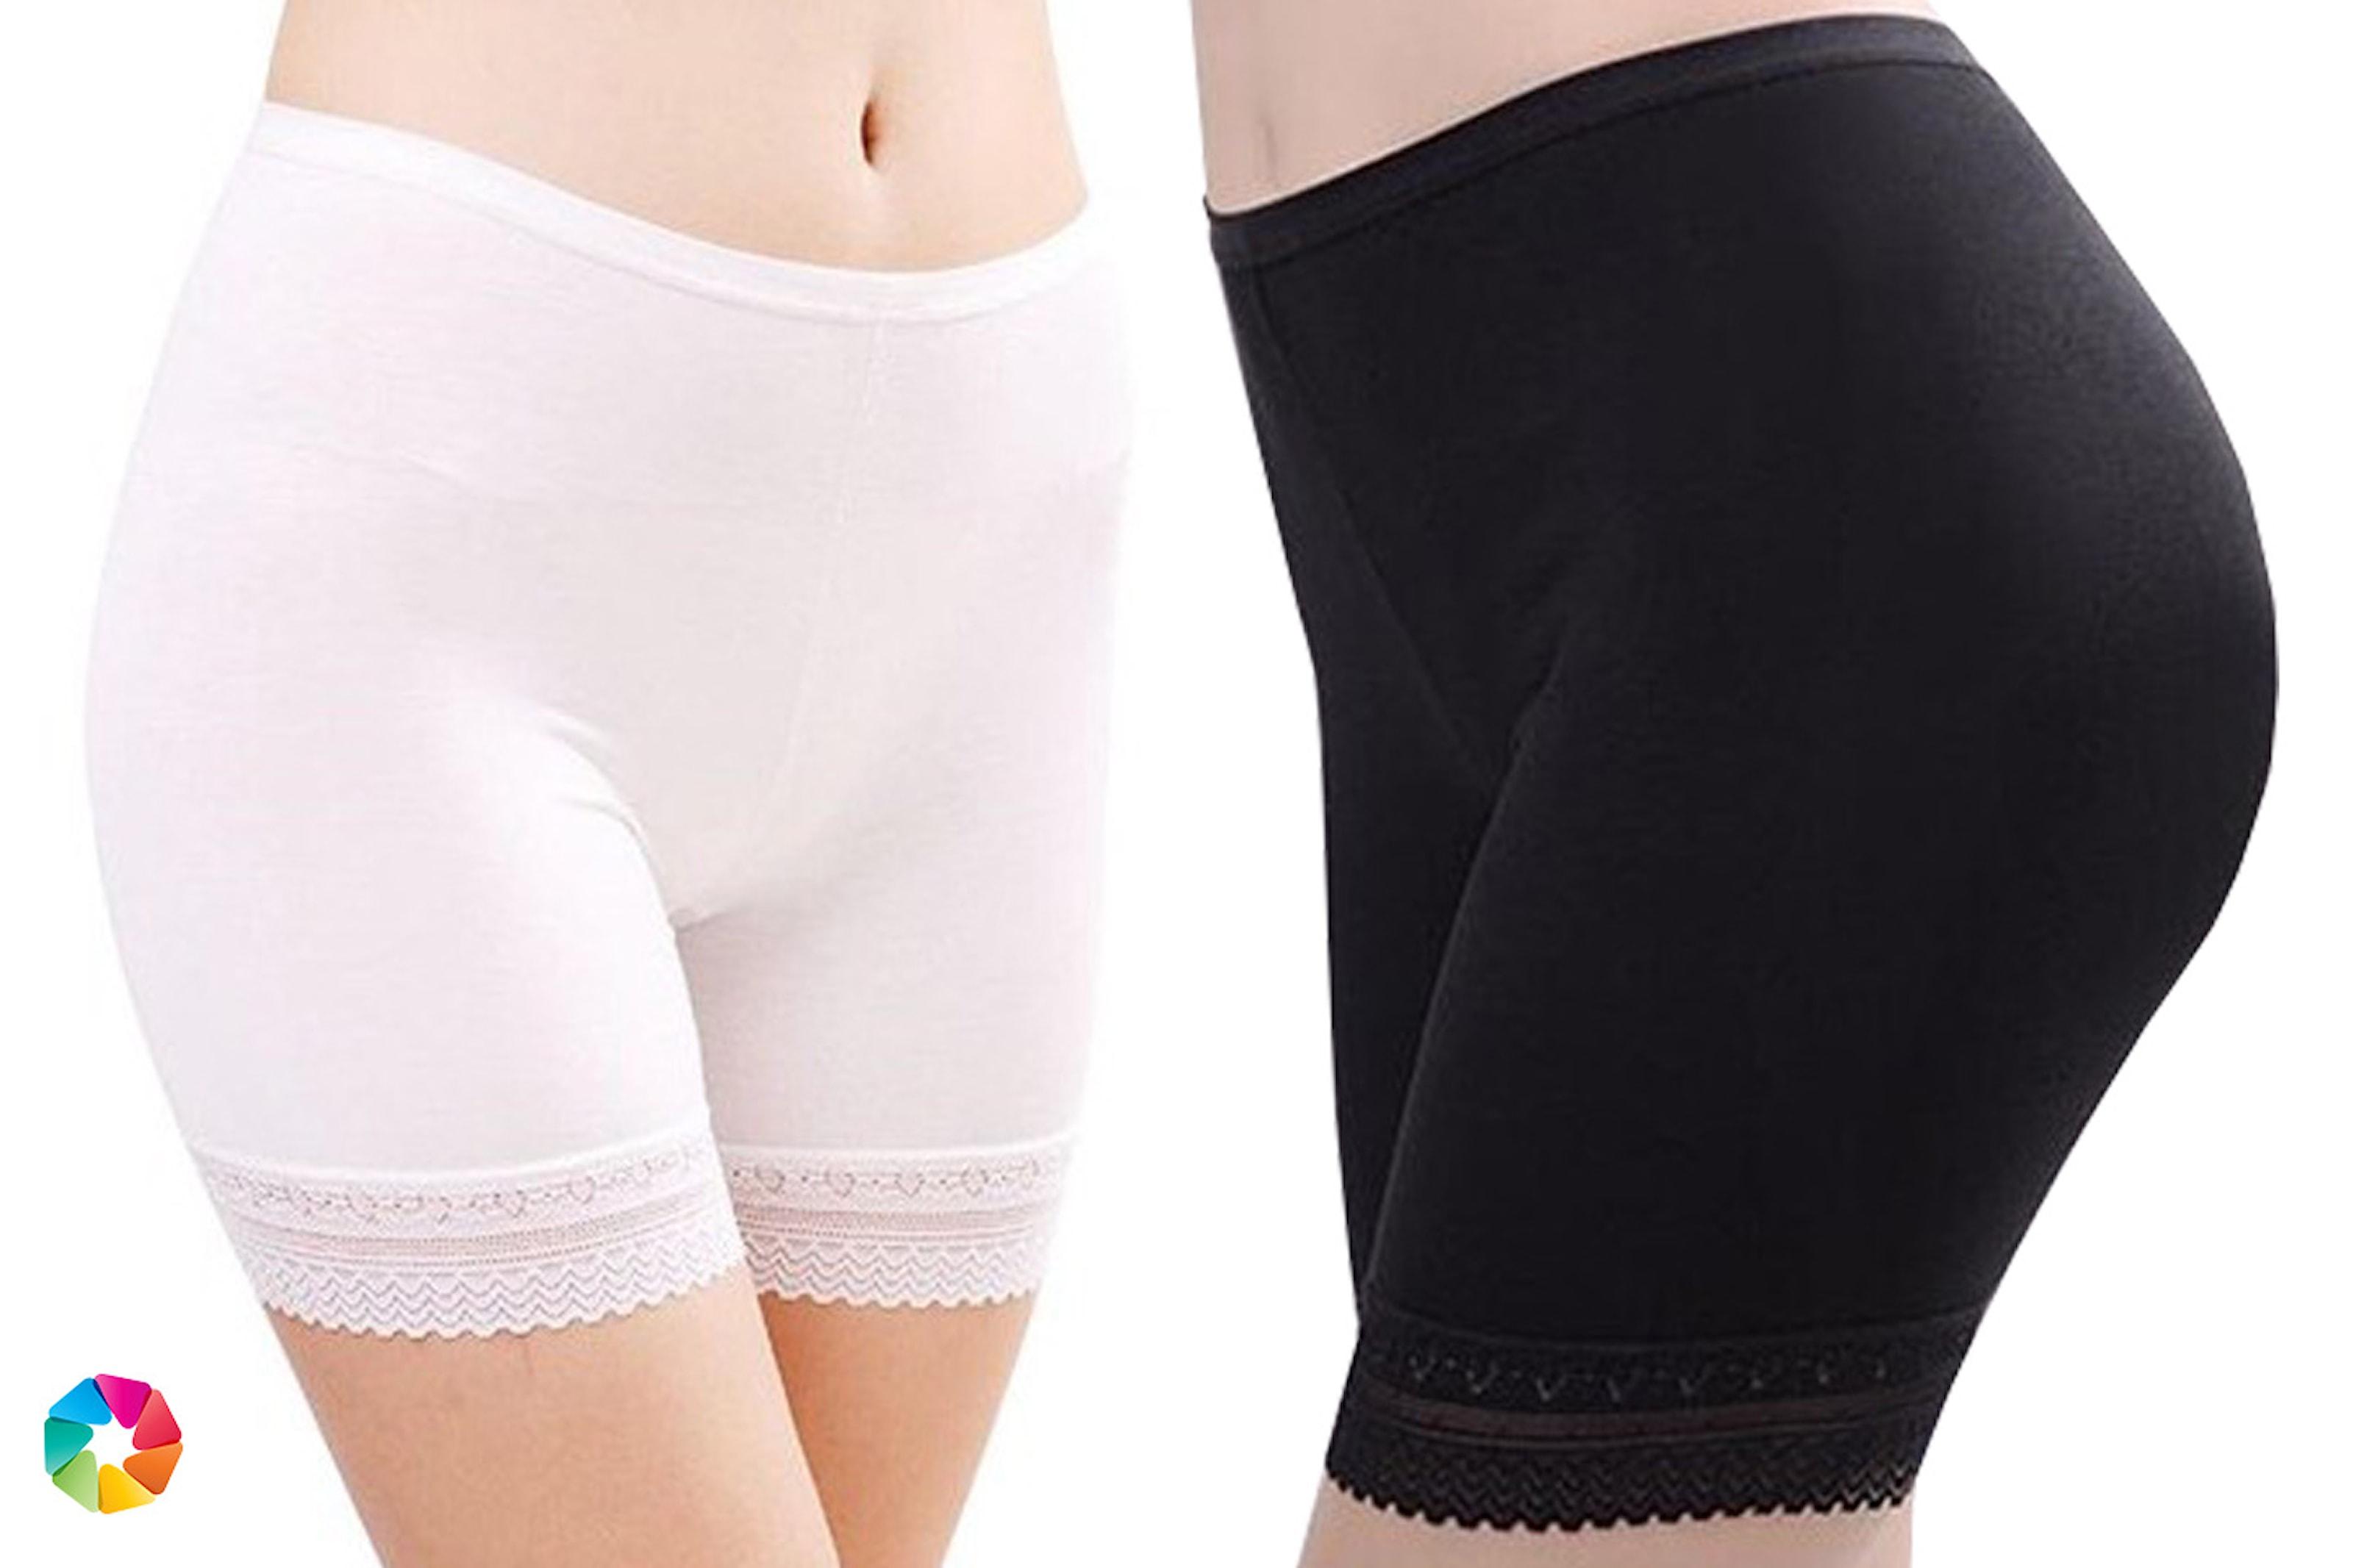 Leggings shorts